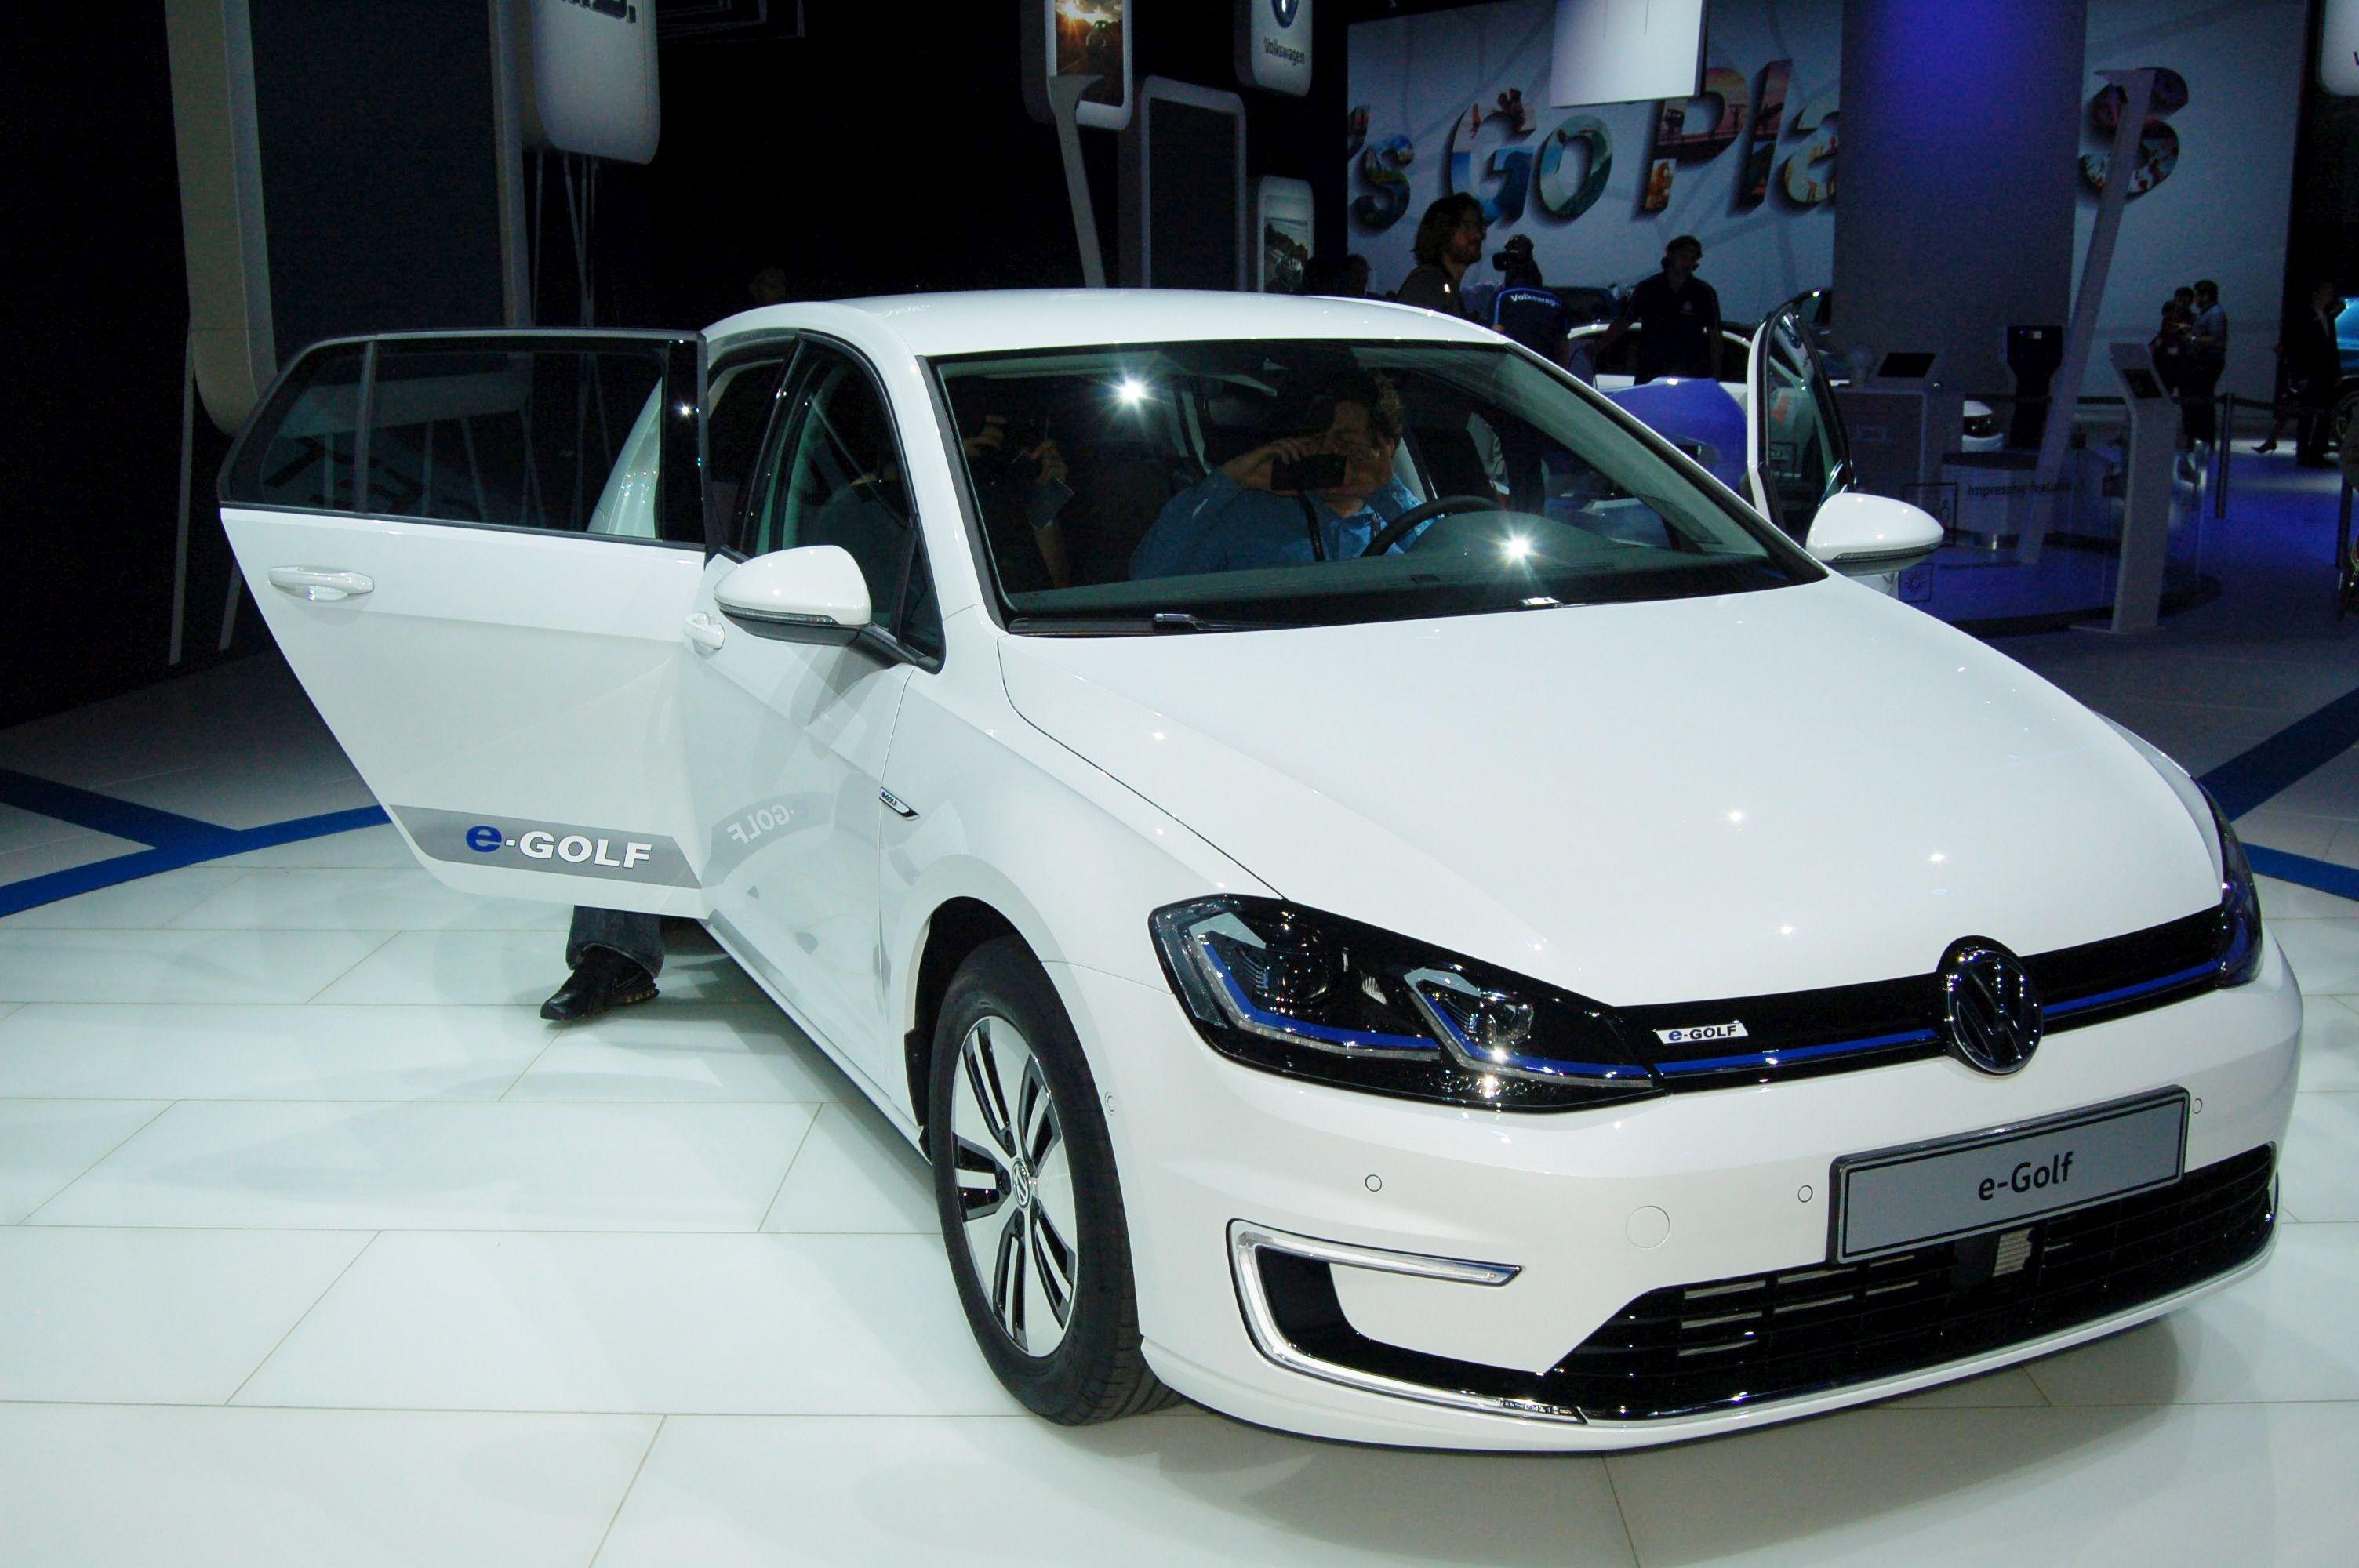 VW e-Golf Boosts Range to 124 Miles